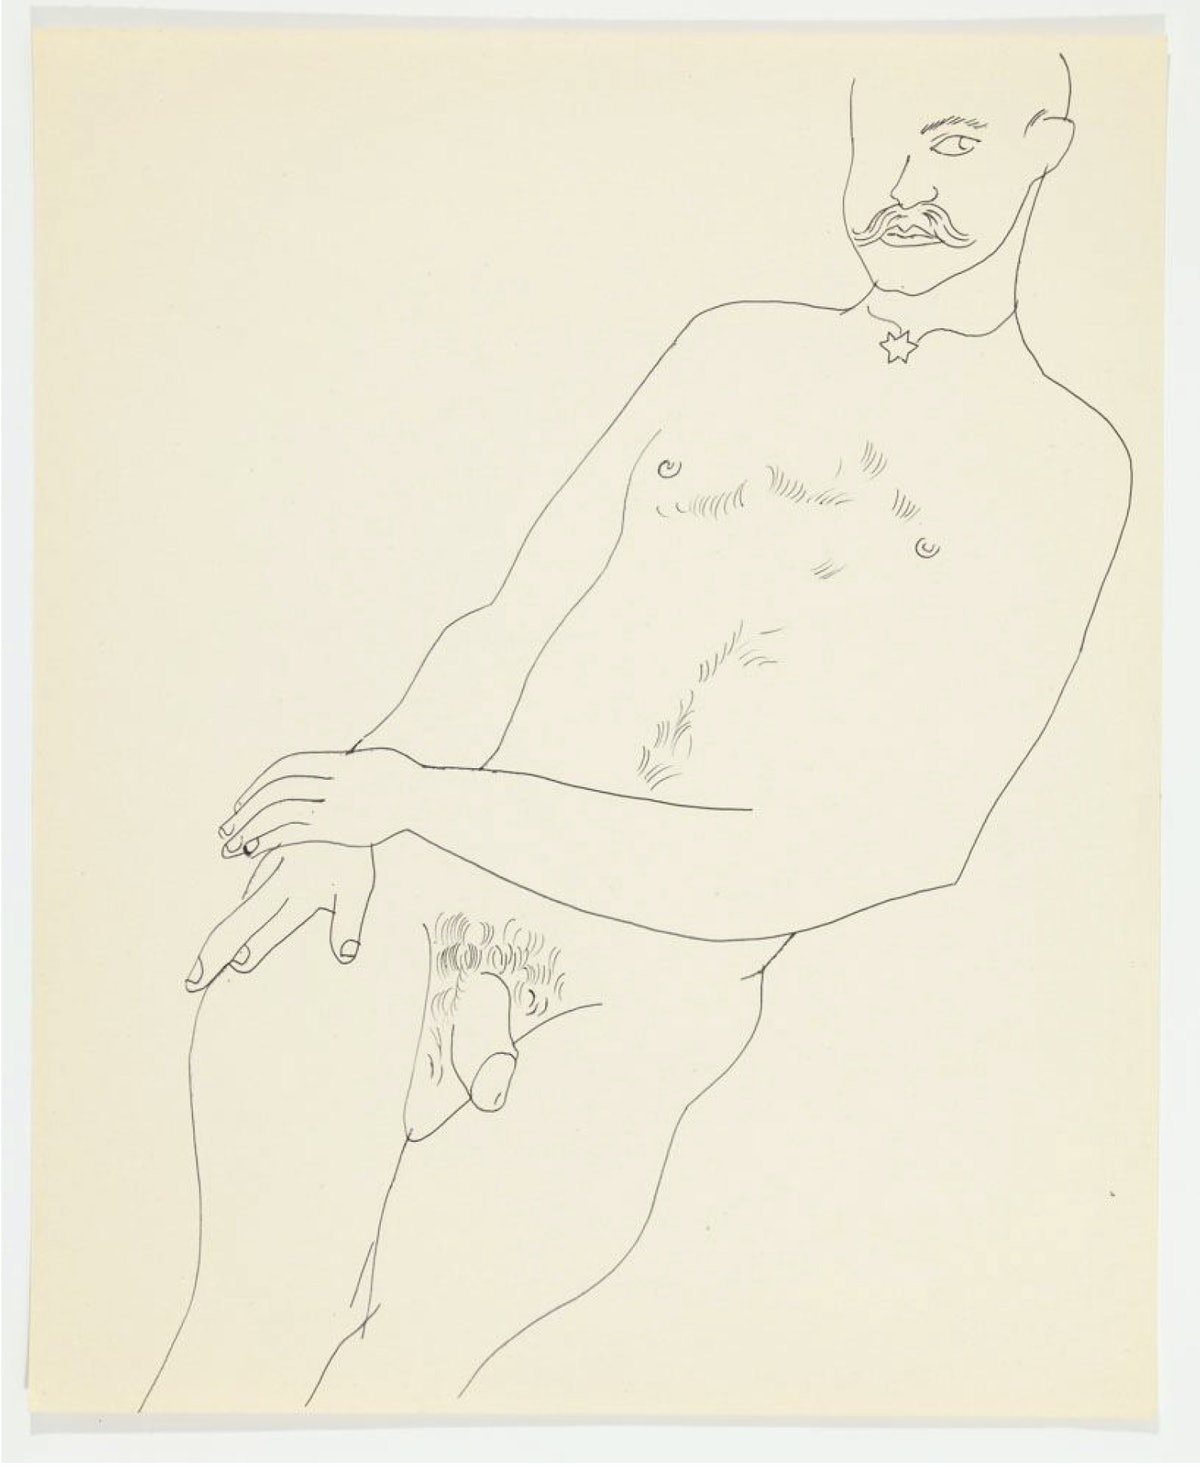 Warhol_Andy_RecliningMaleNudePartialFigure_AK10950.jpg